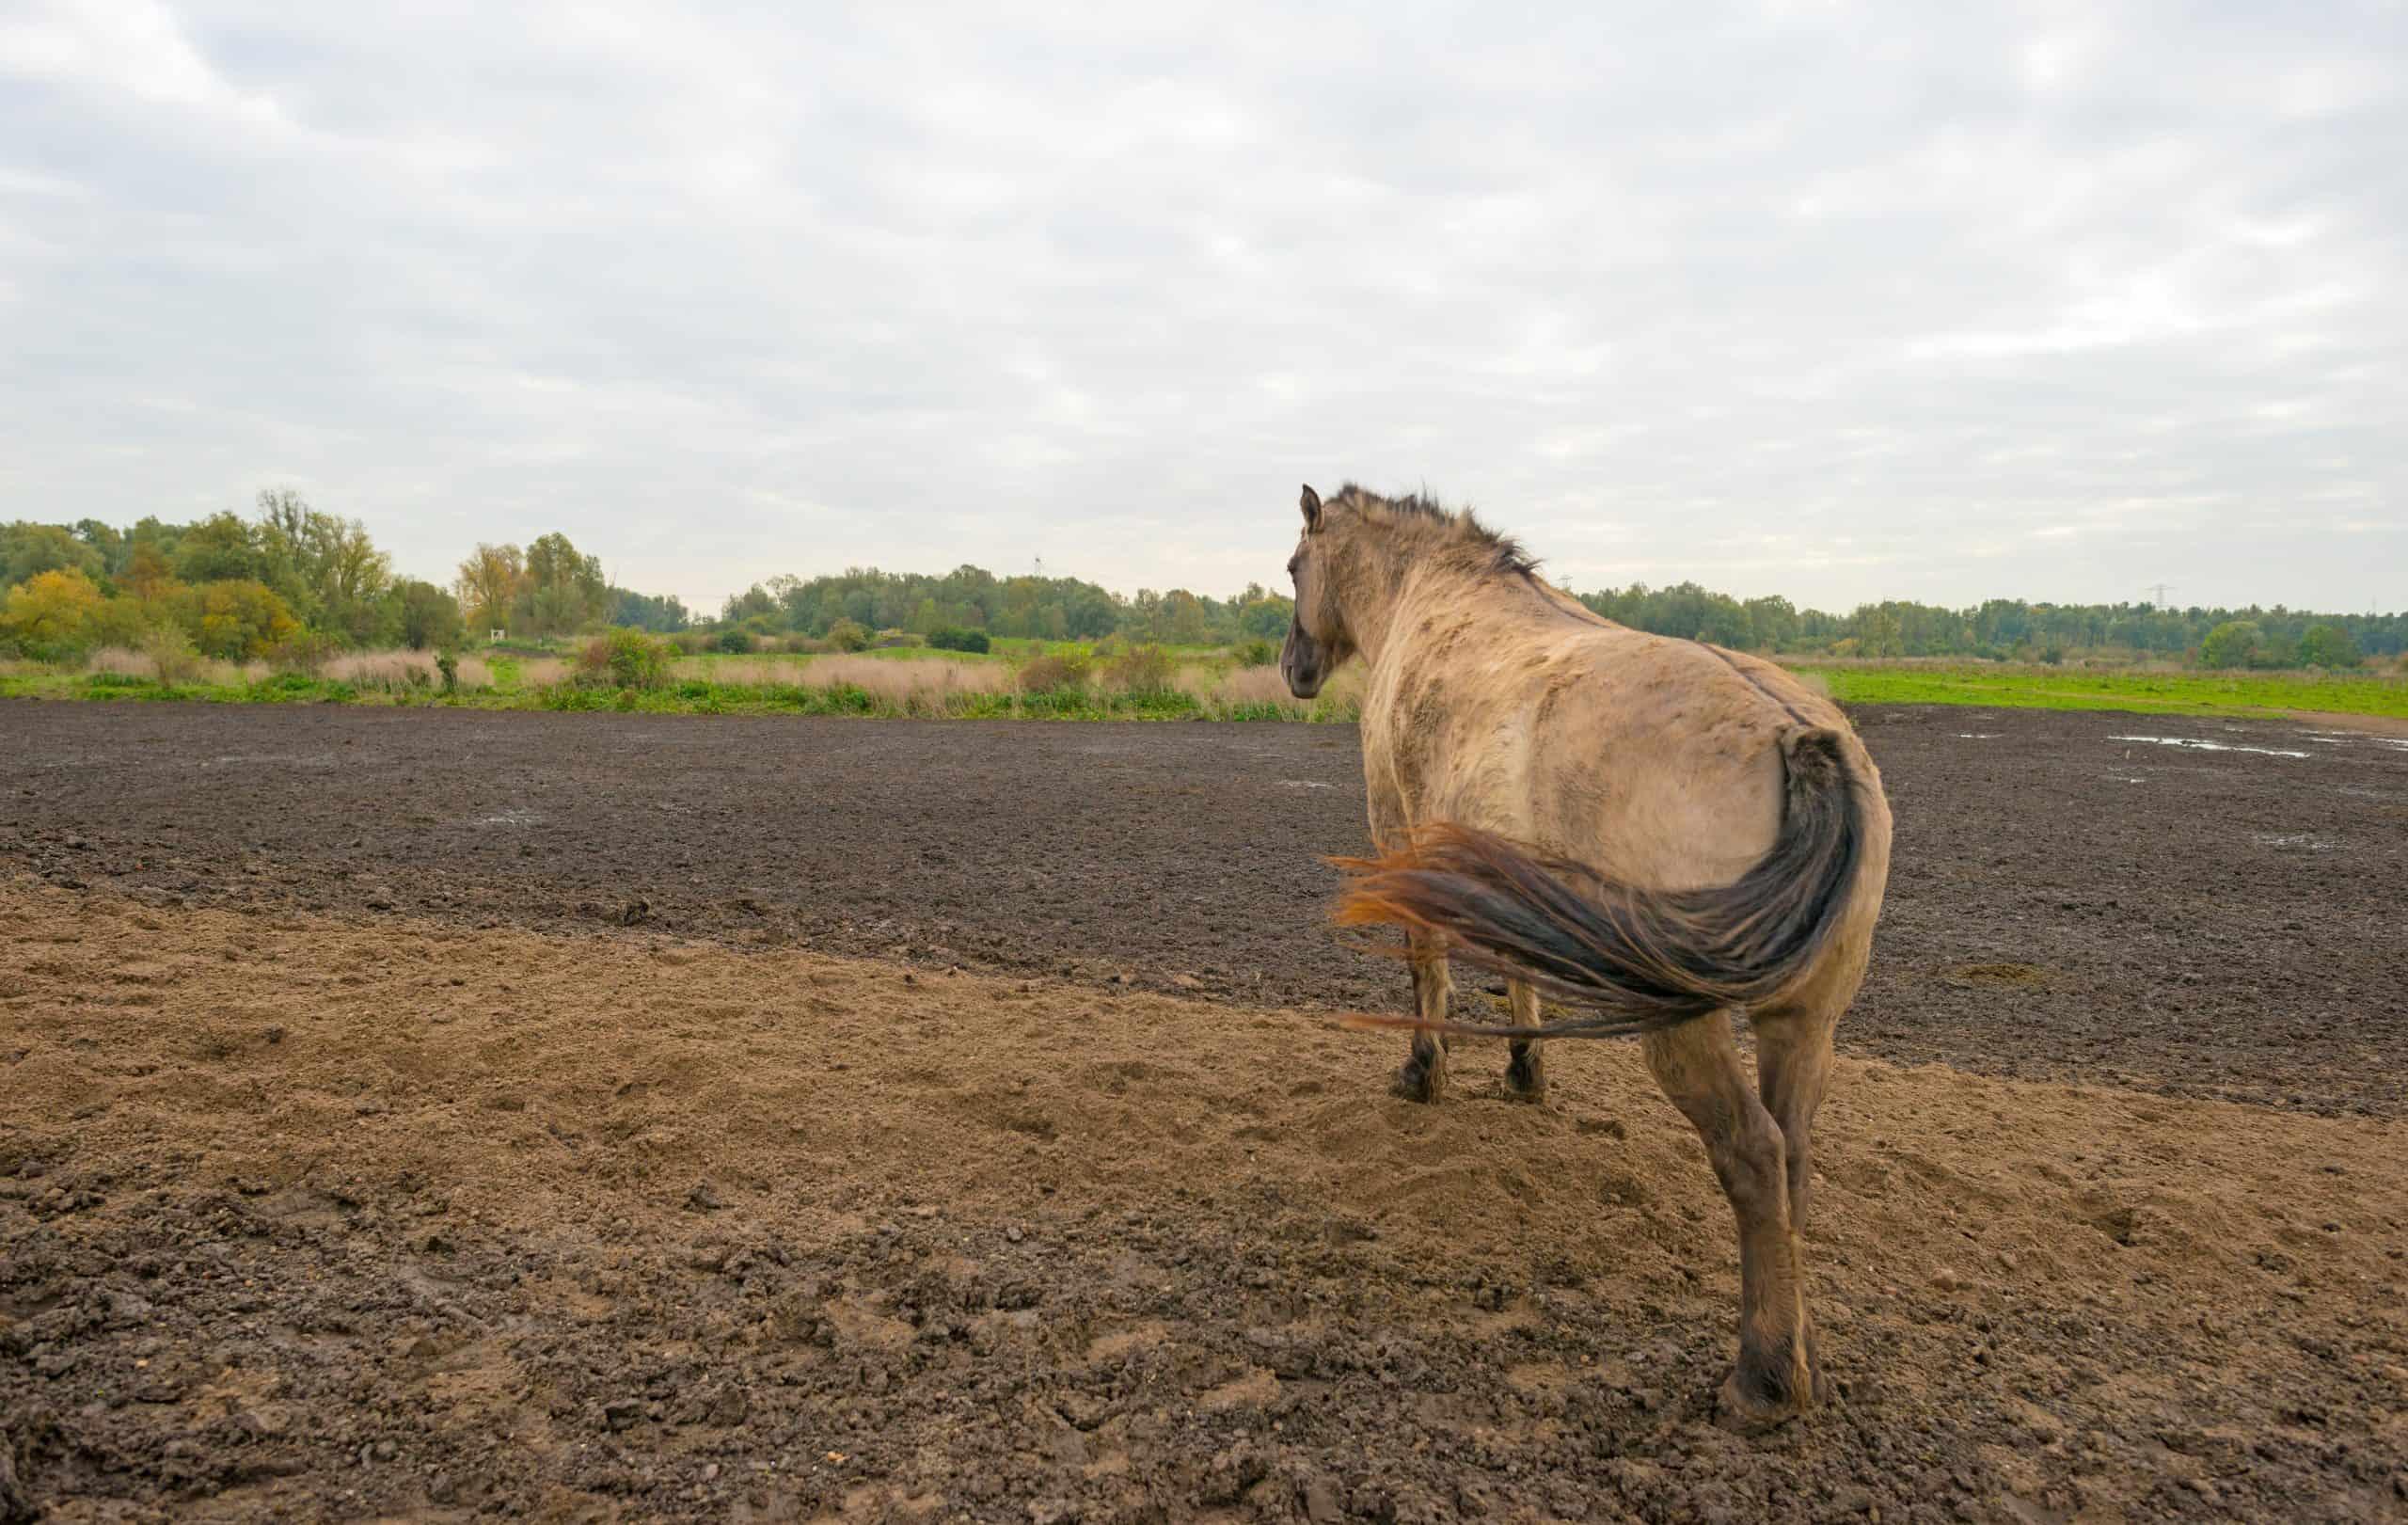 Konik horse on a hill in autumn